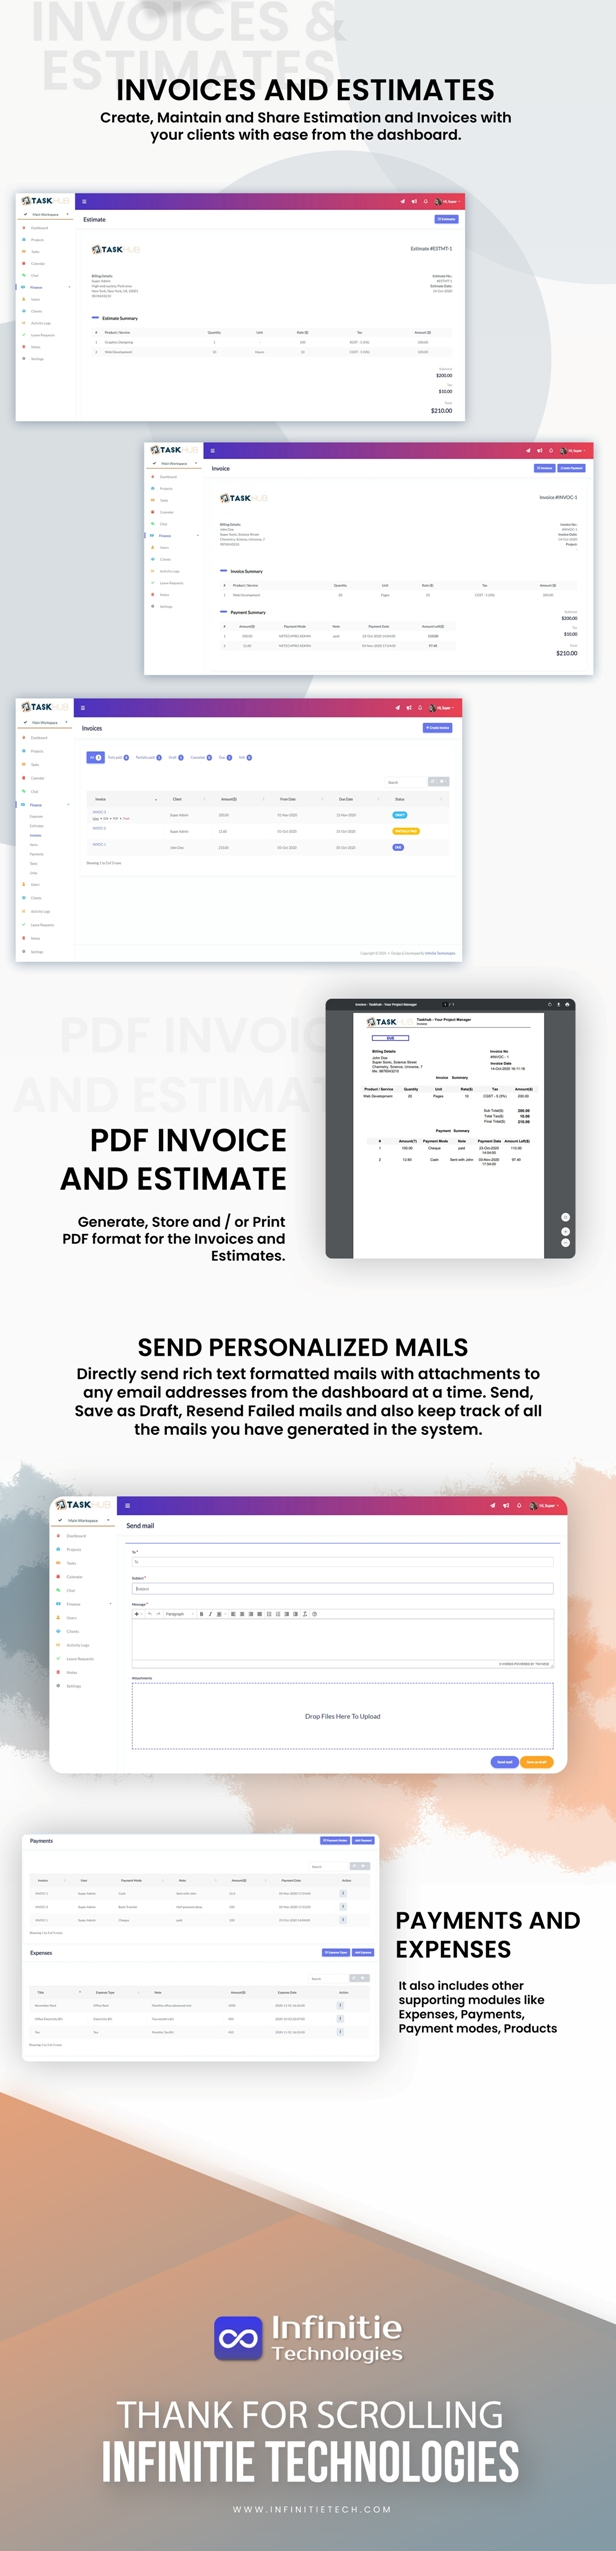 6 - finance-invoices-estimates-payments-expenses-mails - Taskhub SaaS - v1.0